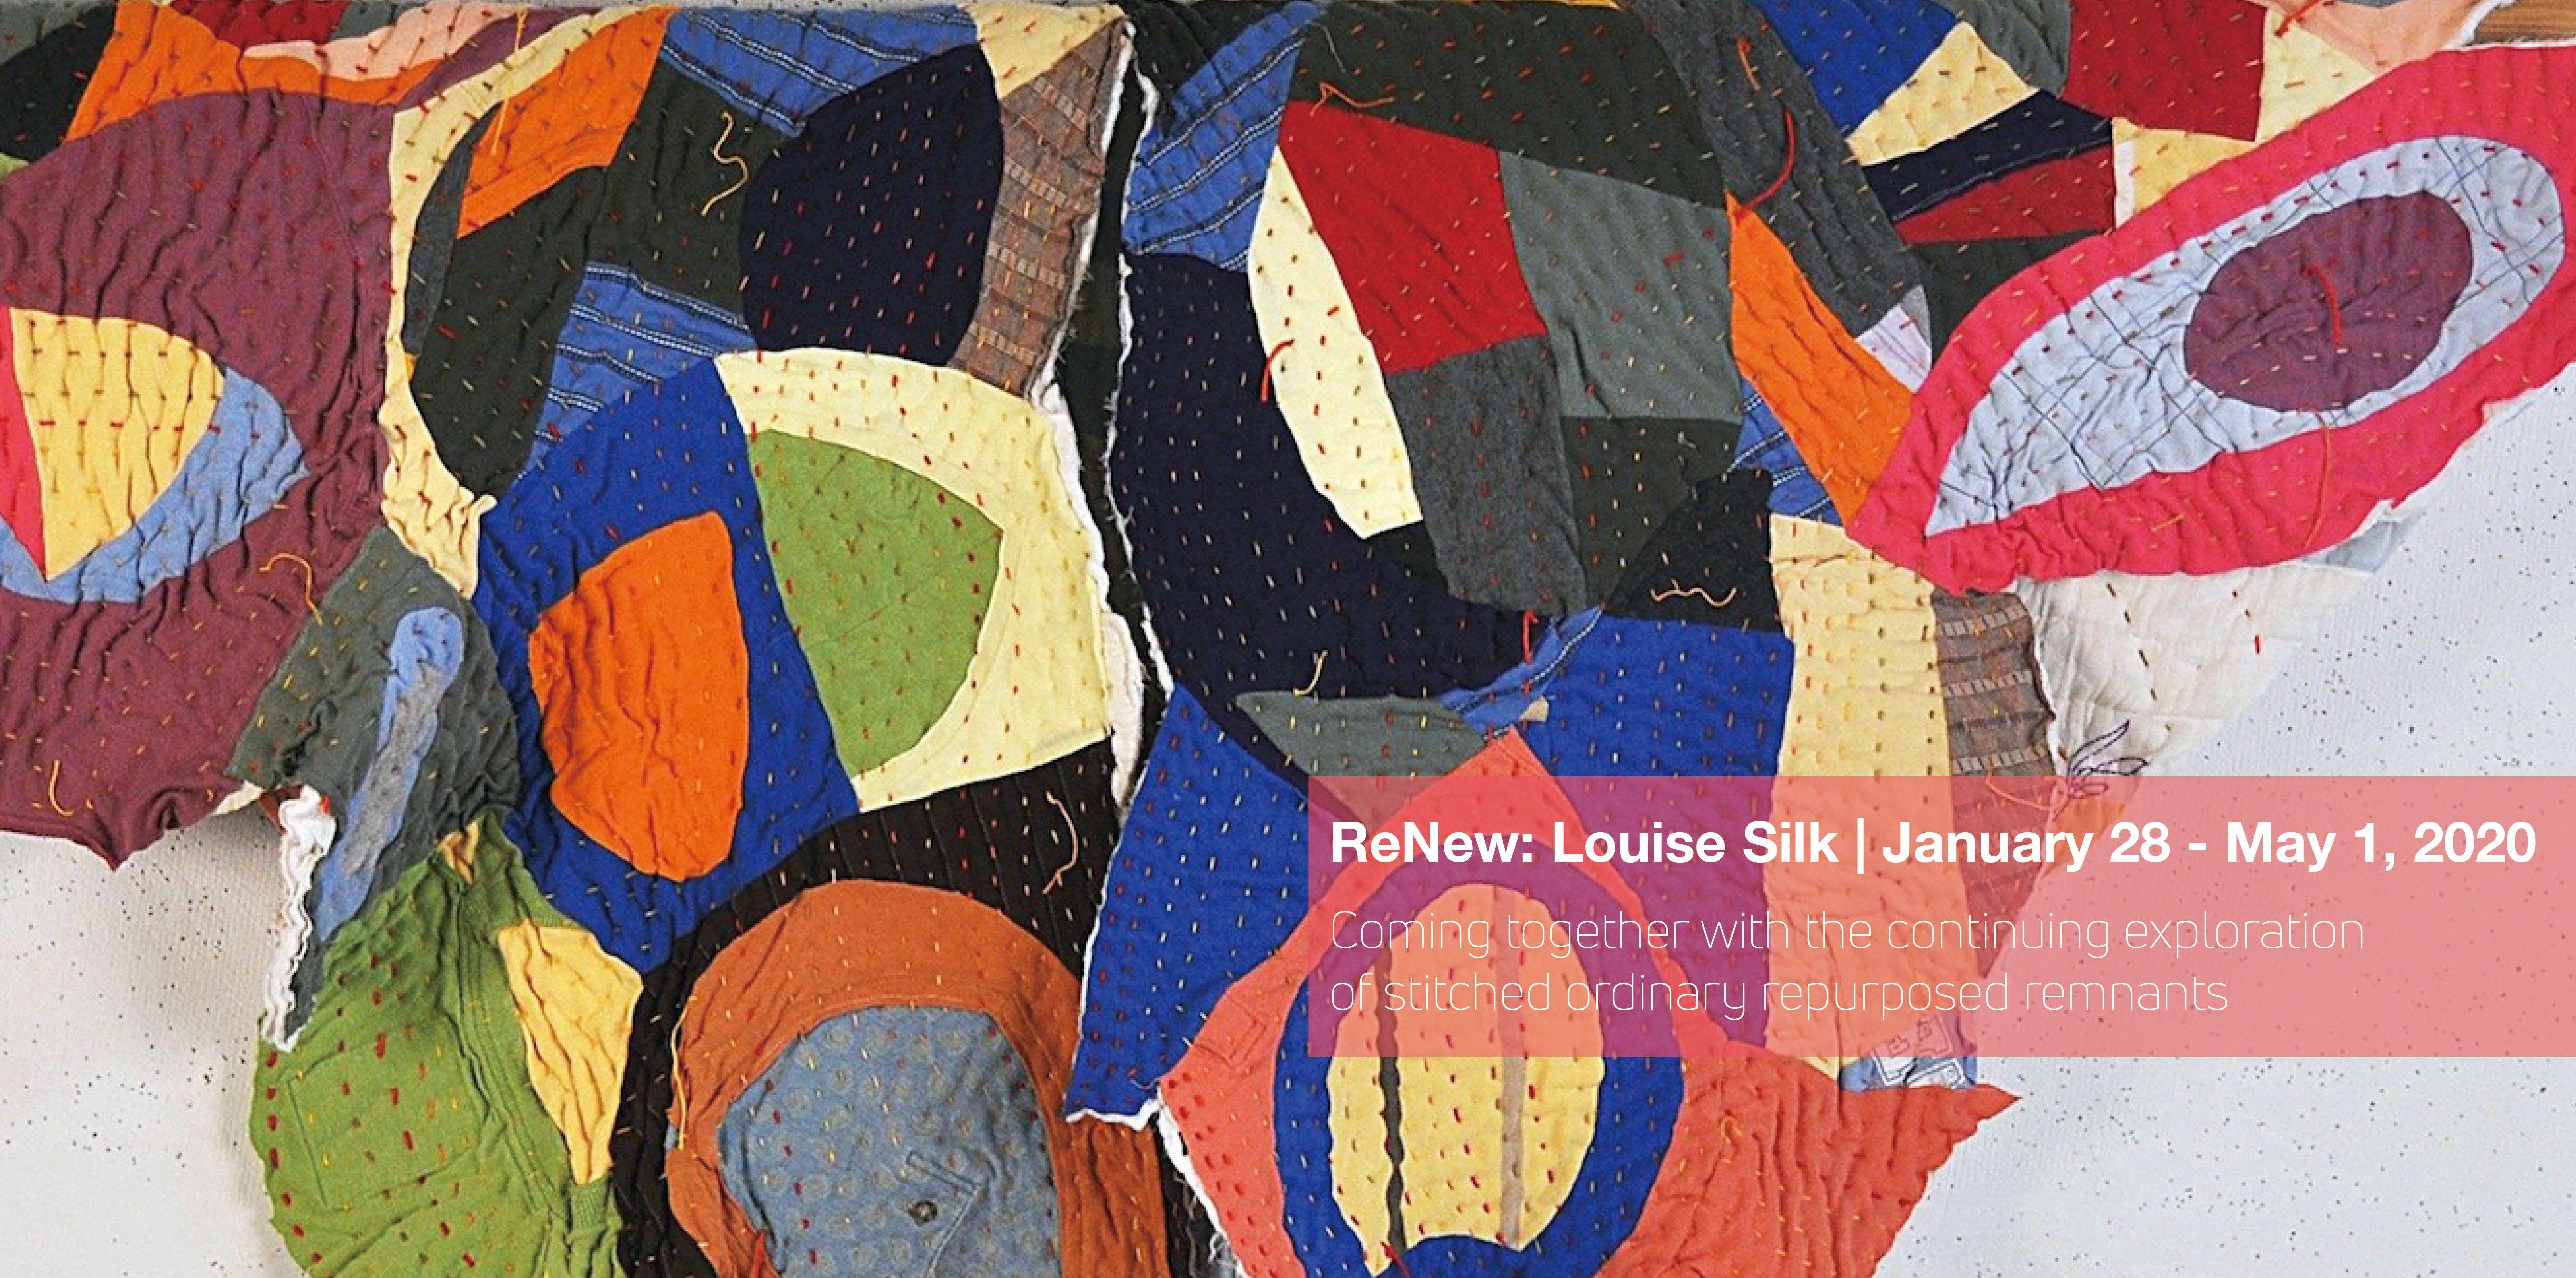 ReNew: Louise Silk exhibition